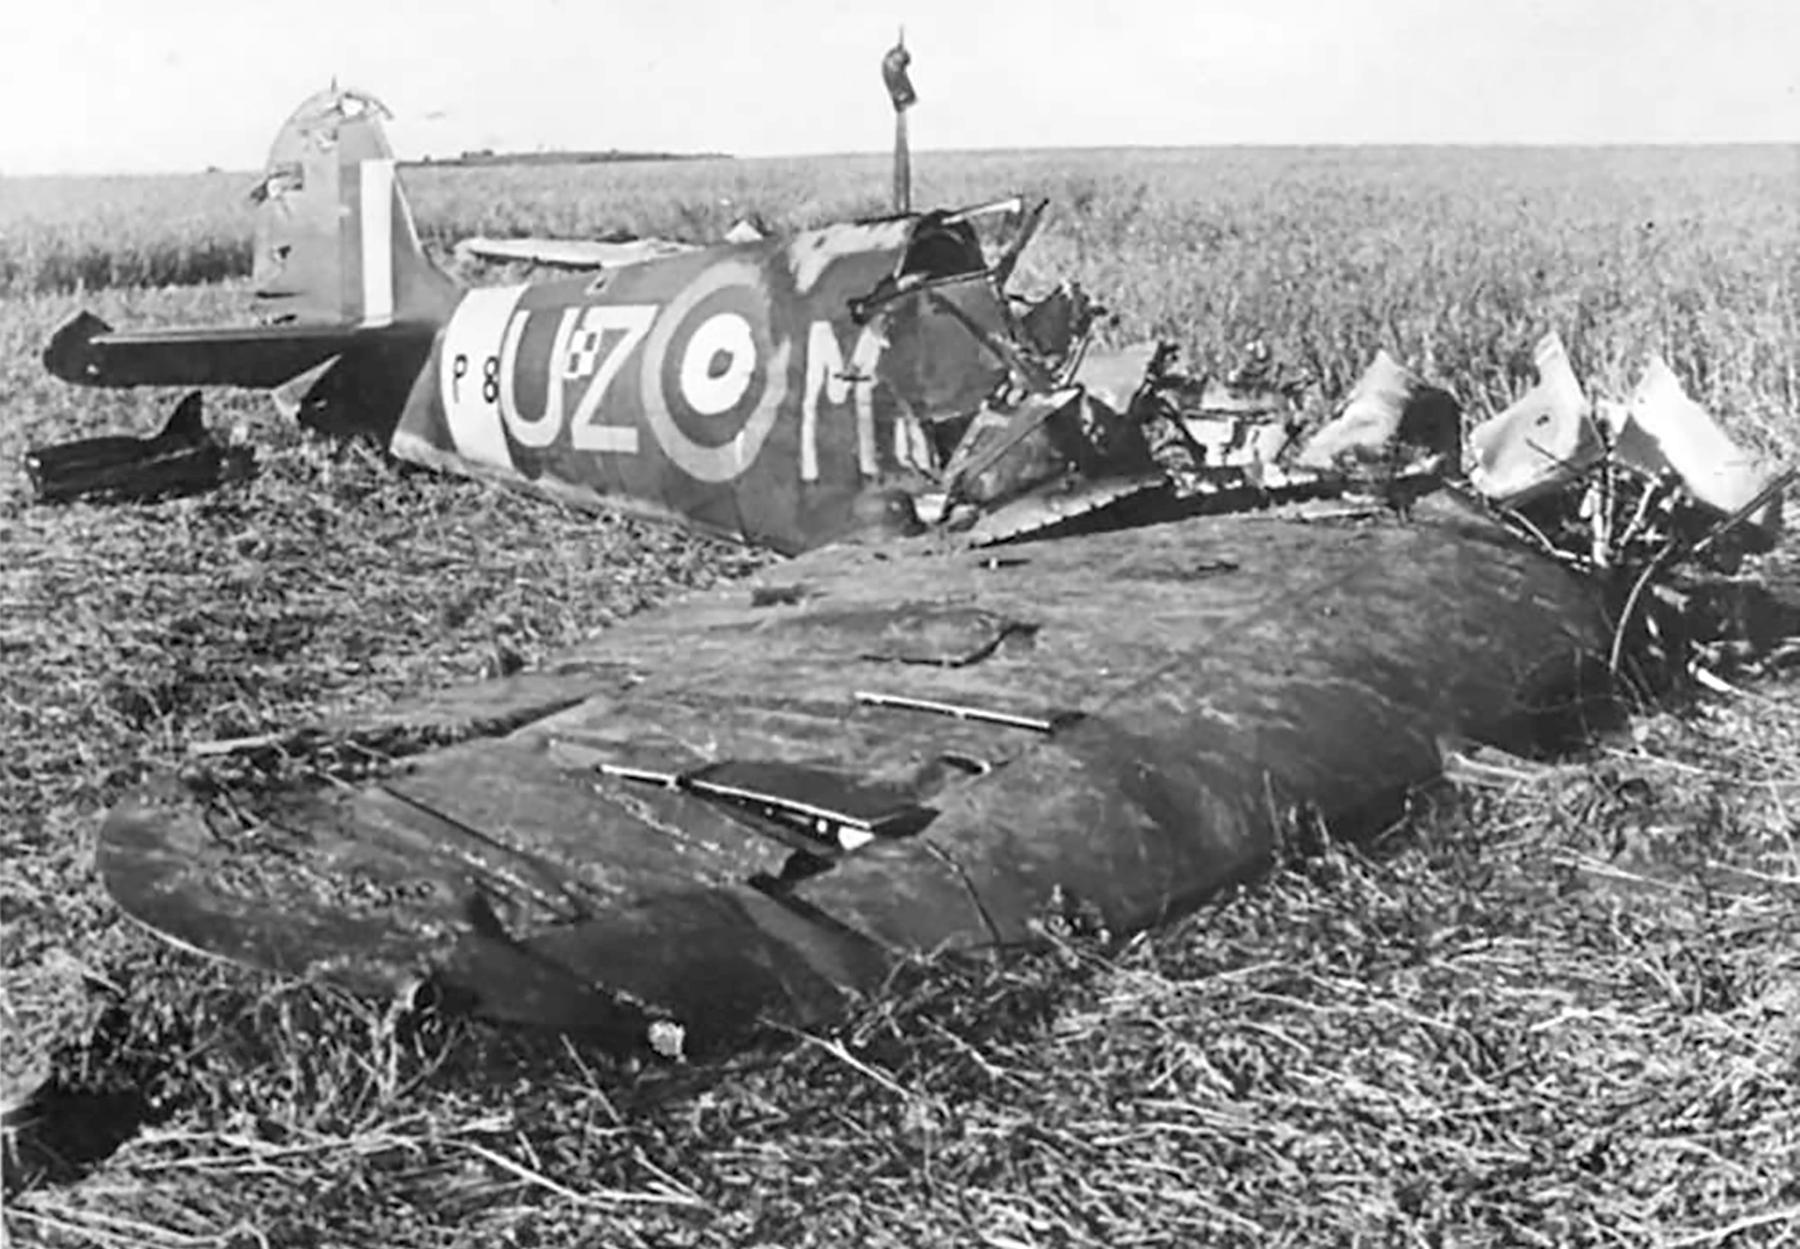 Spitfire MkIIa RAF 306Sqn UZM P8462 crash site Sep 1941 web 01